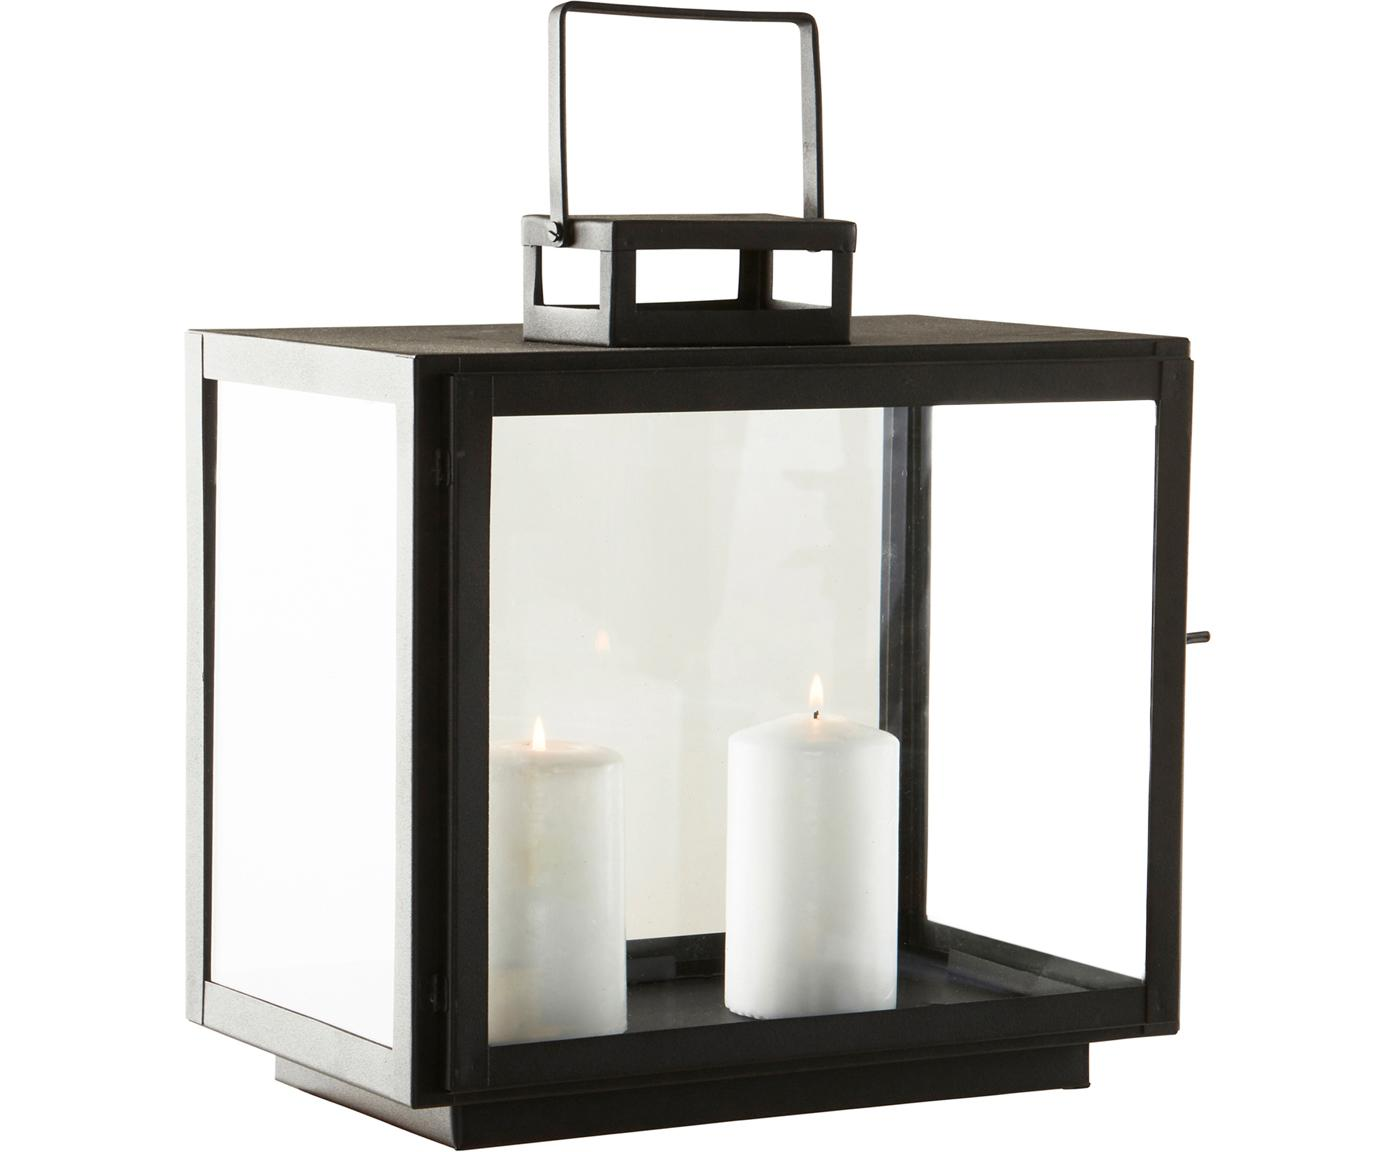 Lanterna Lacie, Struttura: metallo rivestito, Nero, Larg. 32 x Alt. 33 cm